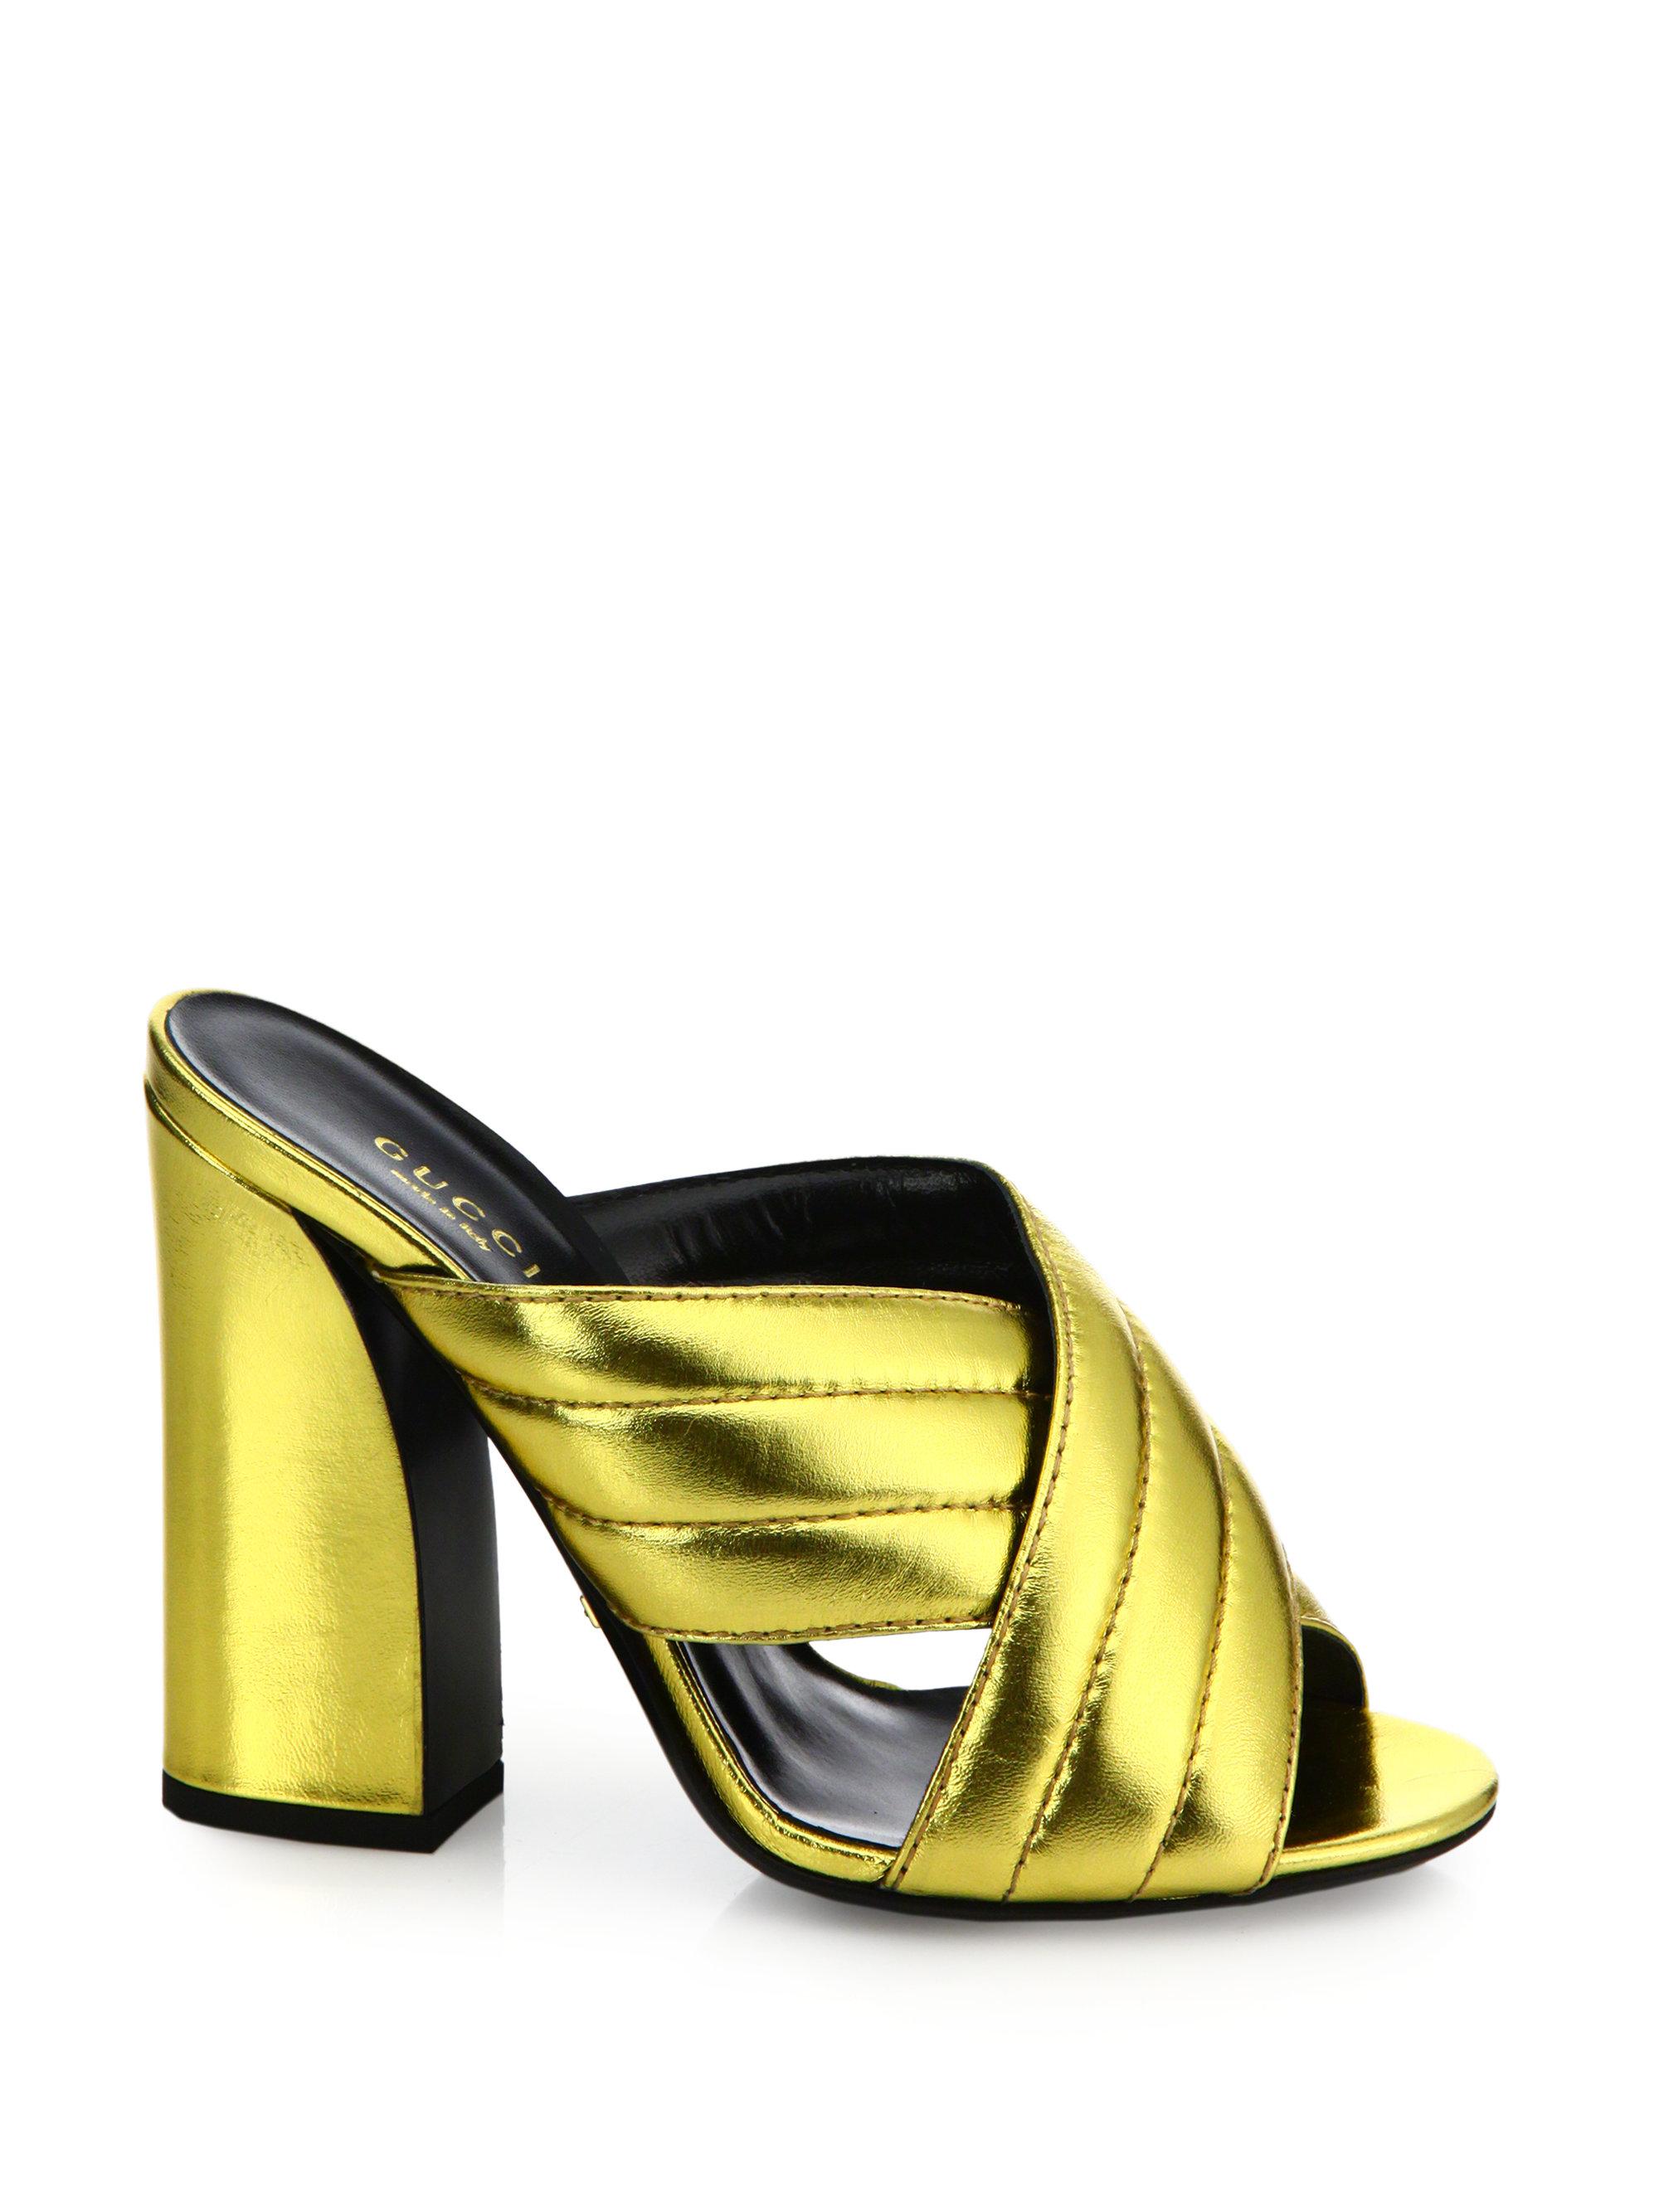 d4040e9e281 Lyst - Gucci Webby Metallic Leather Block-heel Mules in Metallic